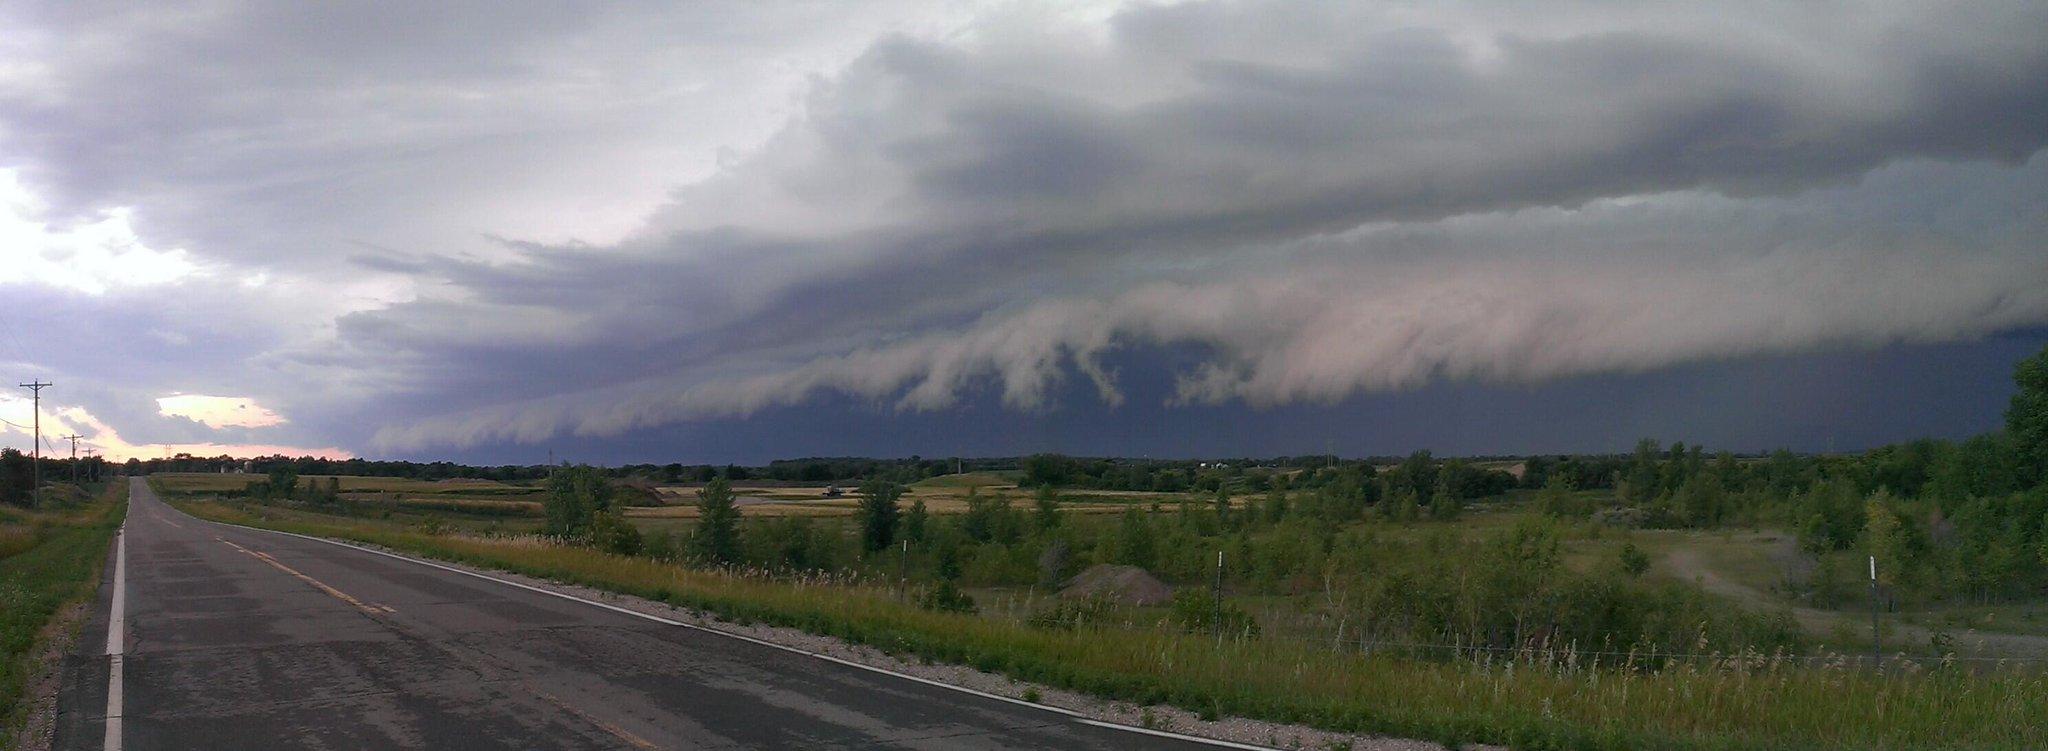 RT @bennyc50 Shelf cloud road. Near Monticello earlier. #mnwx http://t.co/5papHCLc9Z